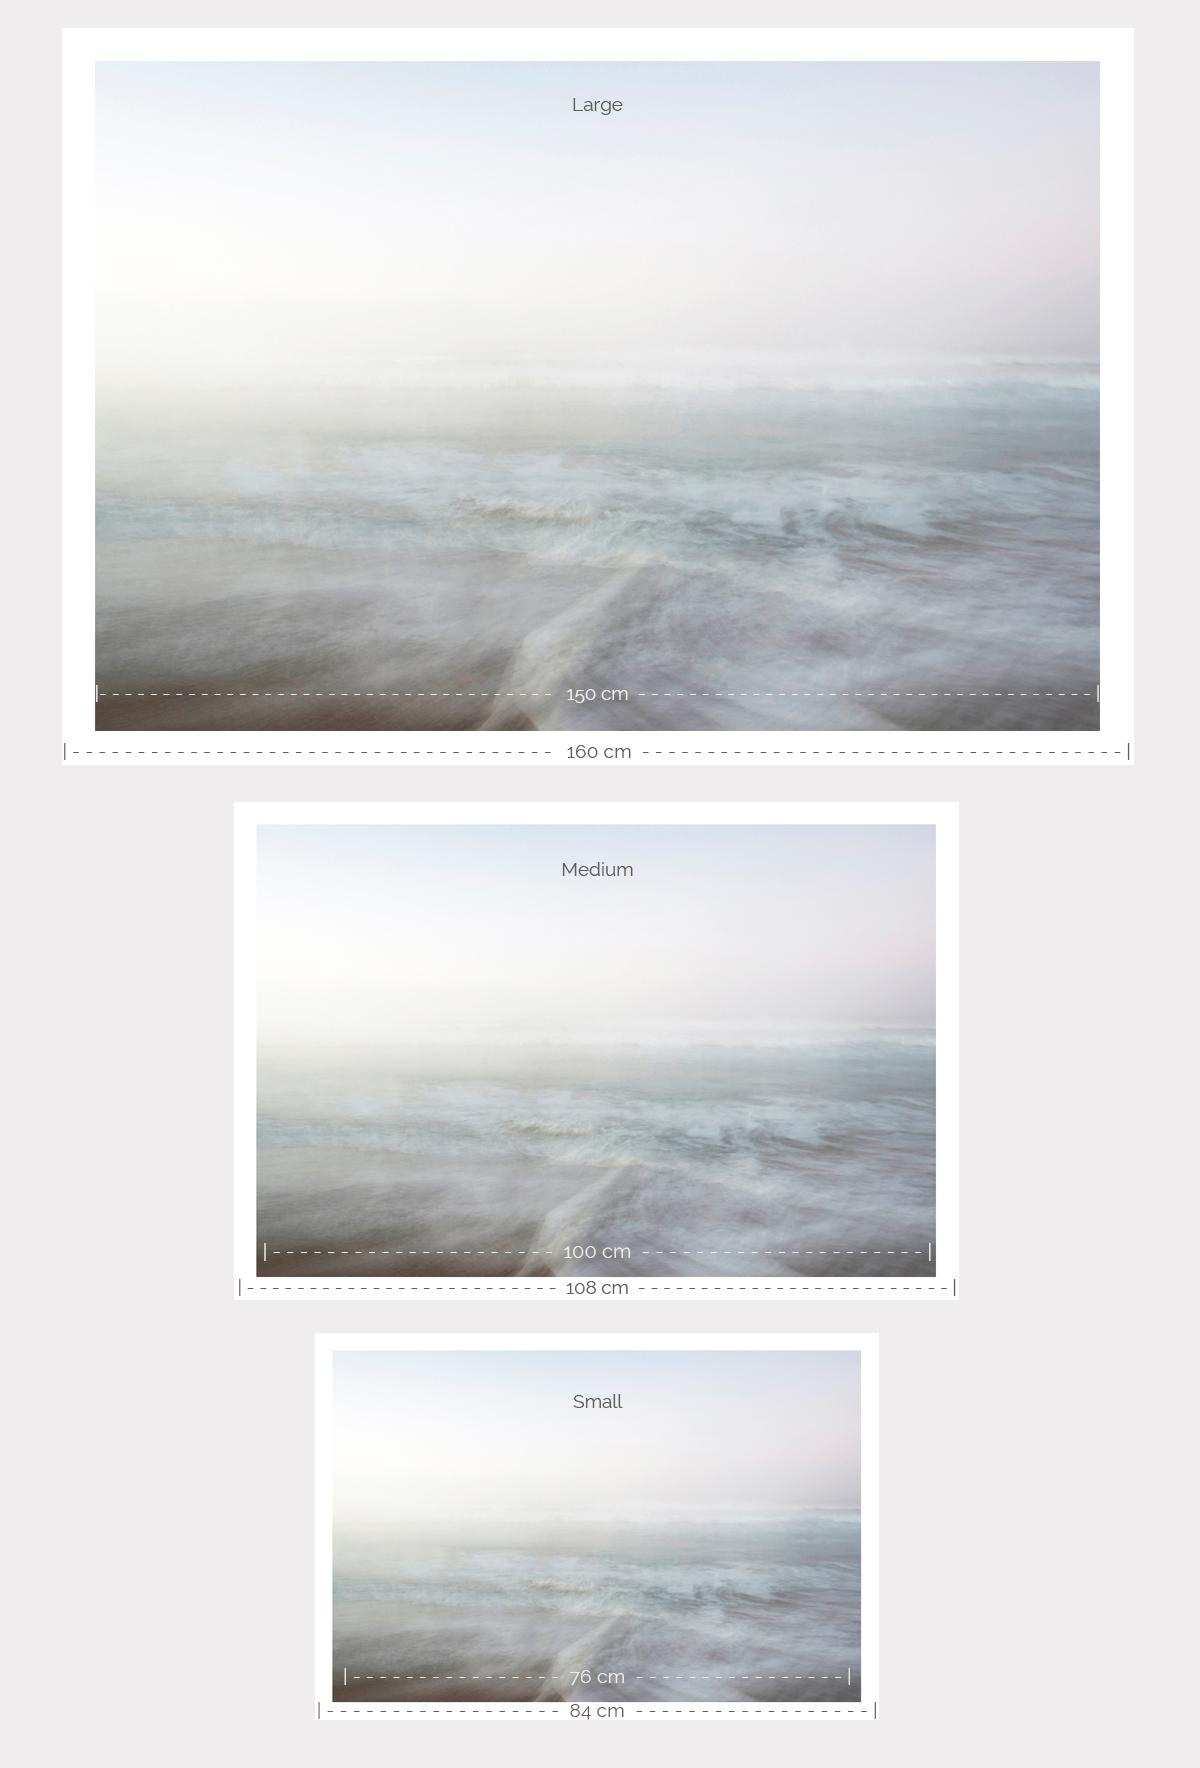 is-joanne-piechota-subdued-memories-photographic-art